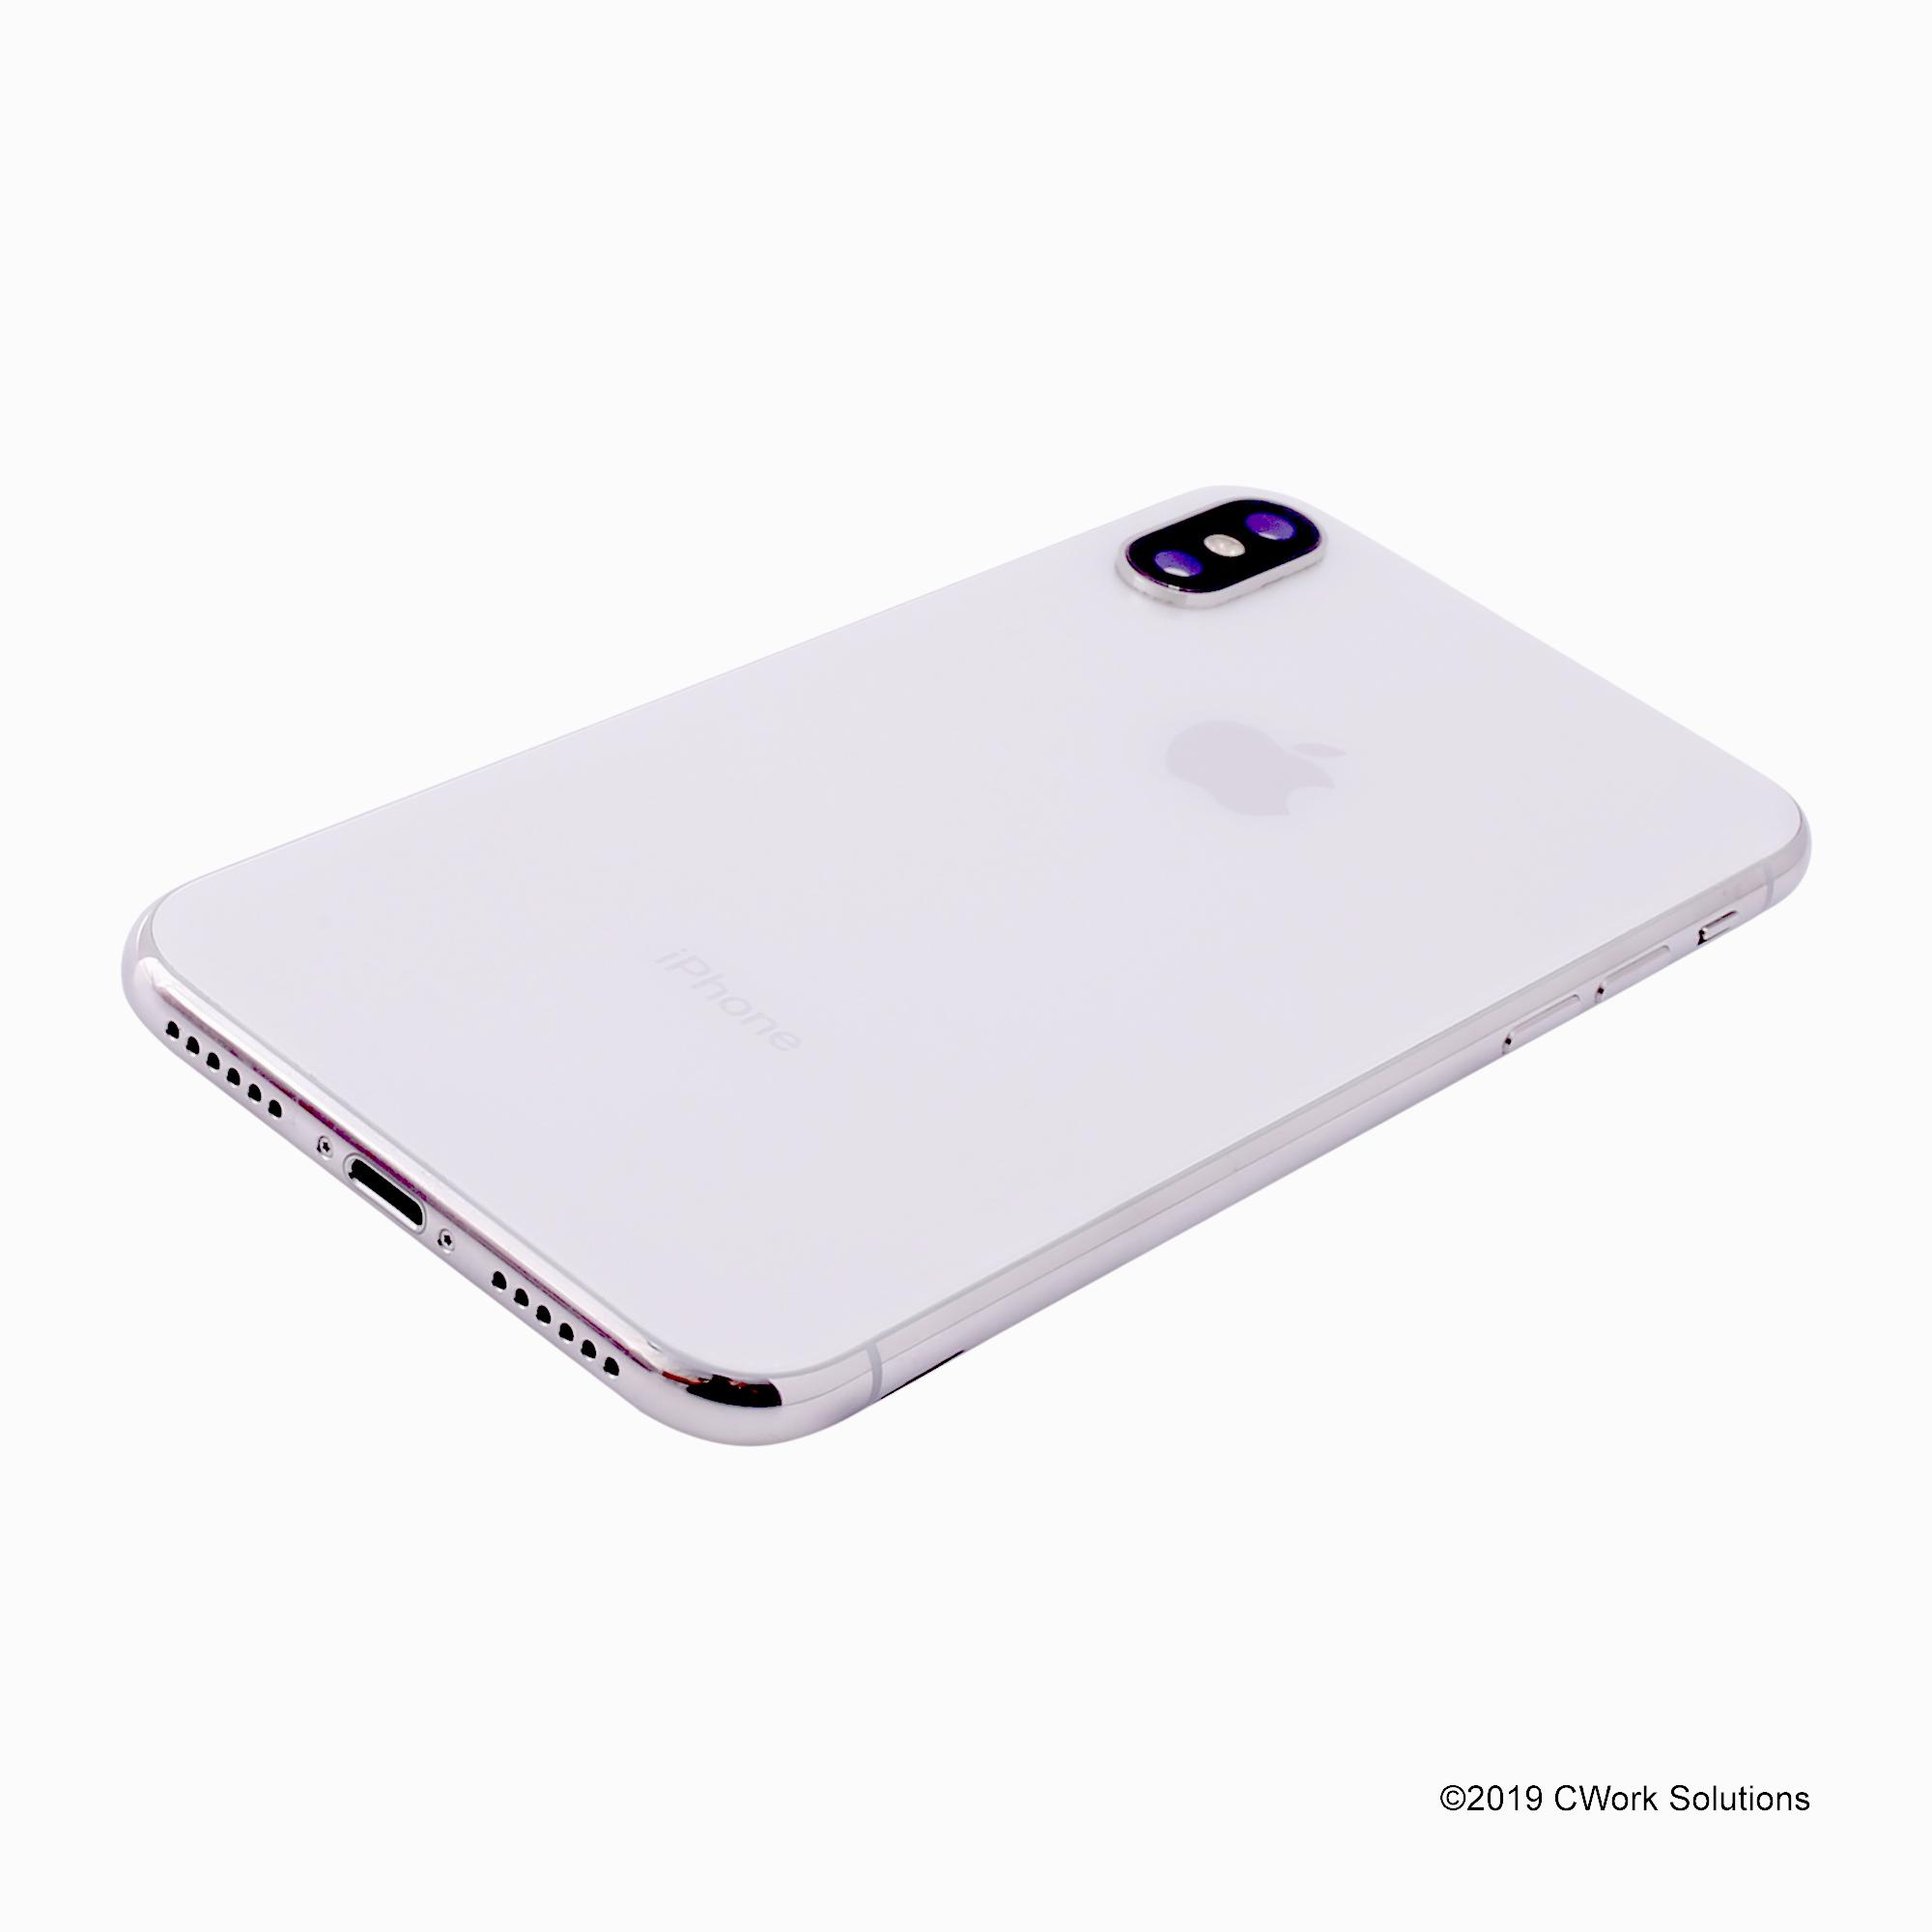 Apple-iPhone-X-a1865-64GB-Verizon-Unlocked-Very-Good thumbnail 6